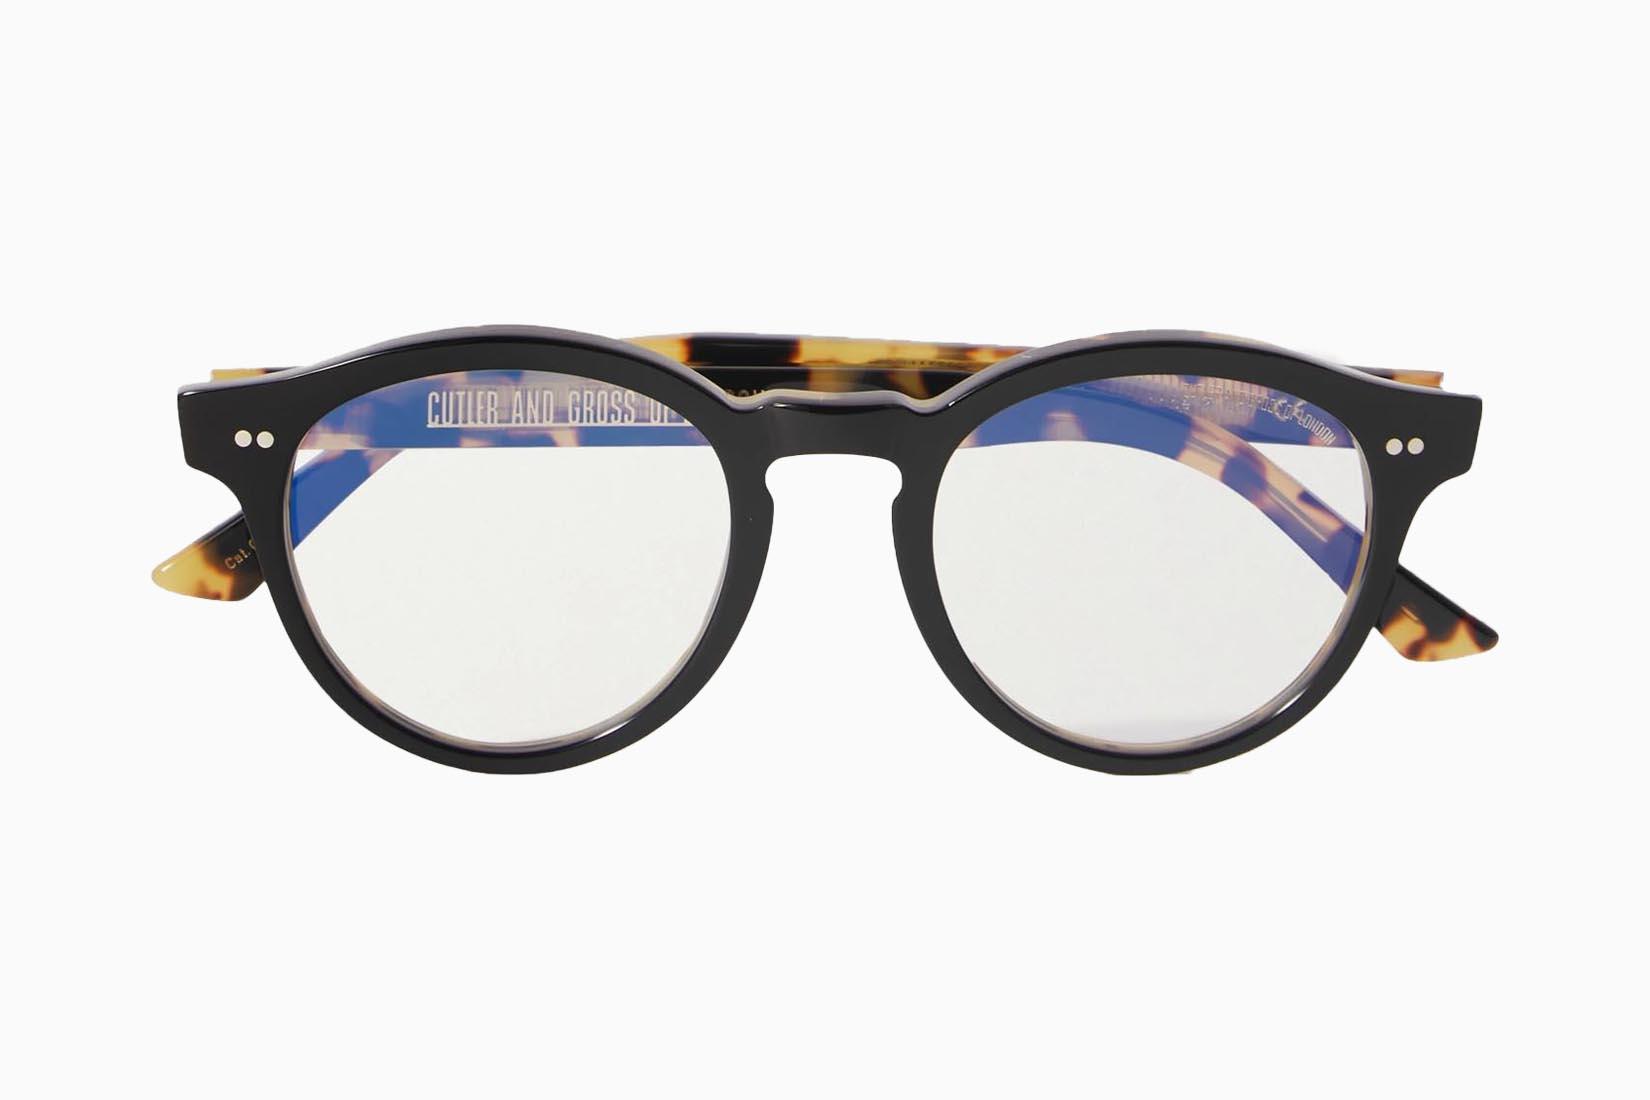 best blue light blocking glasses Cutler and Gross review Luxe Digital